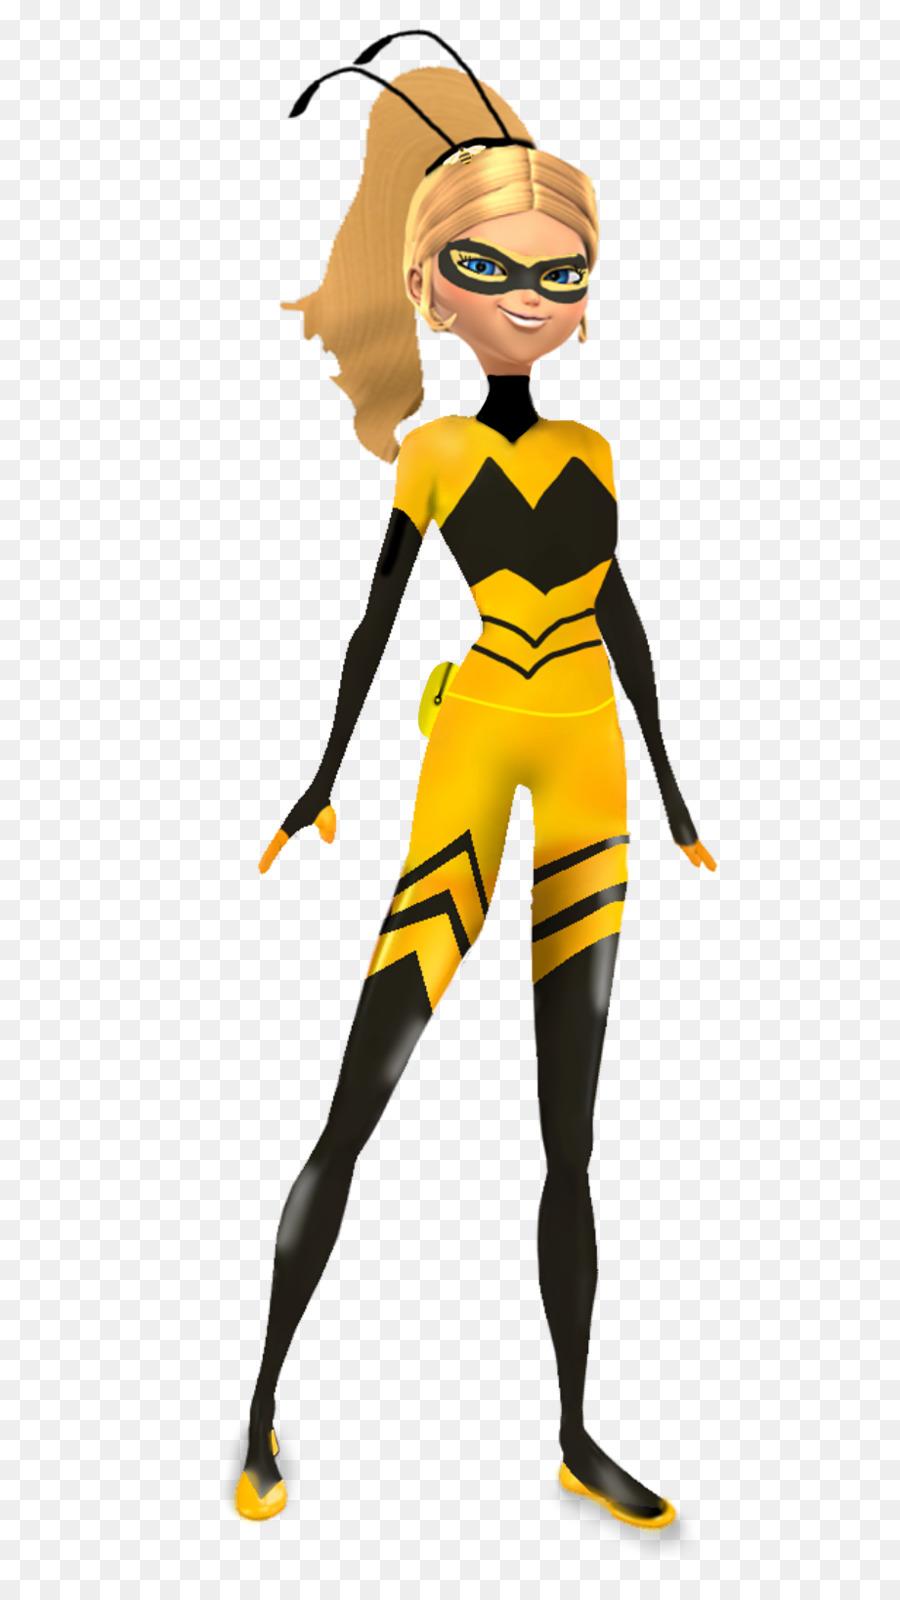 Queen bee insect beehive. Bees clipart superhero